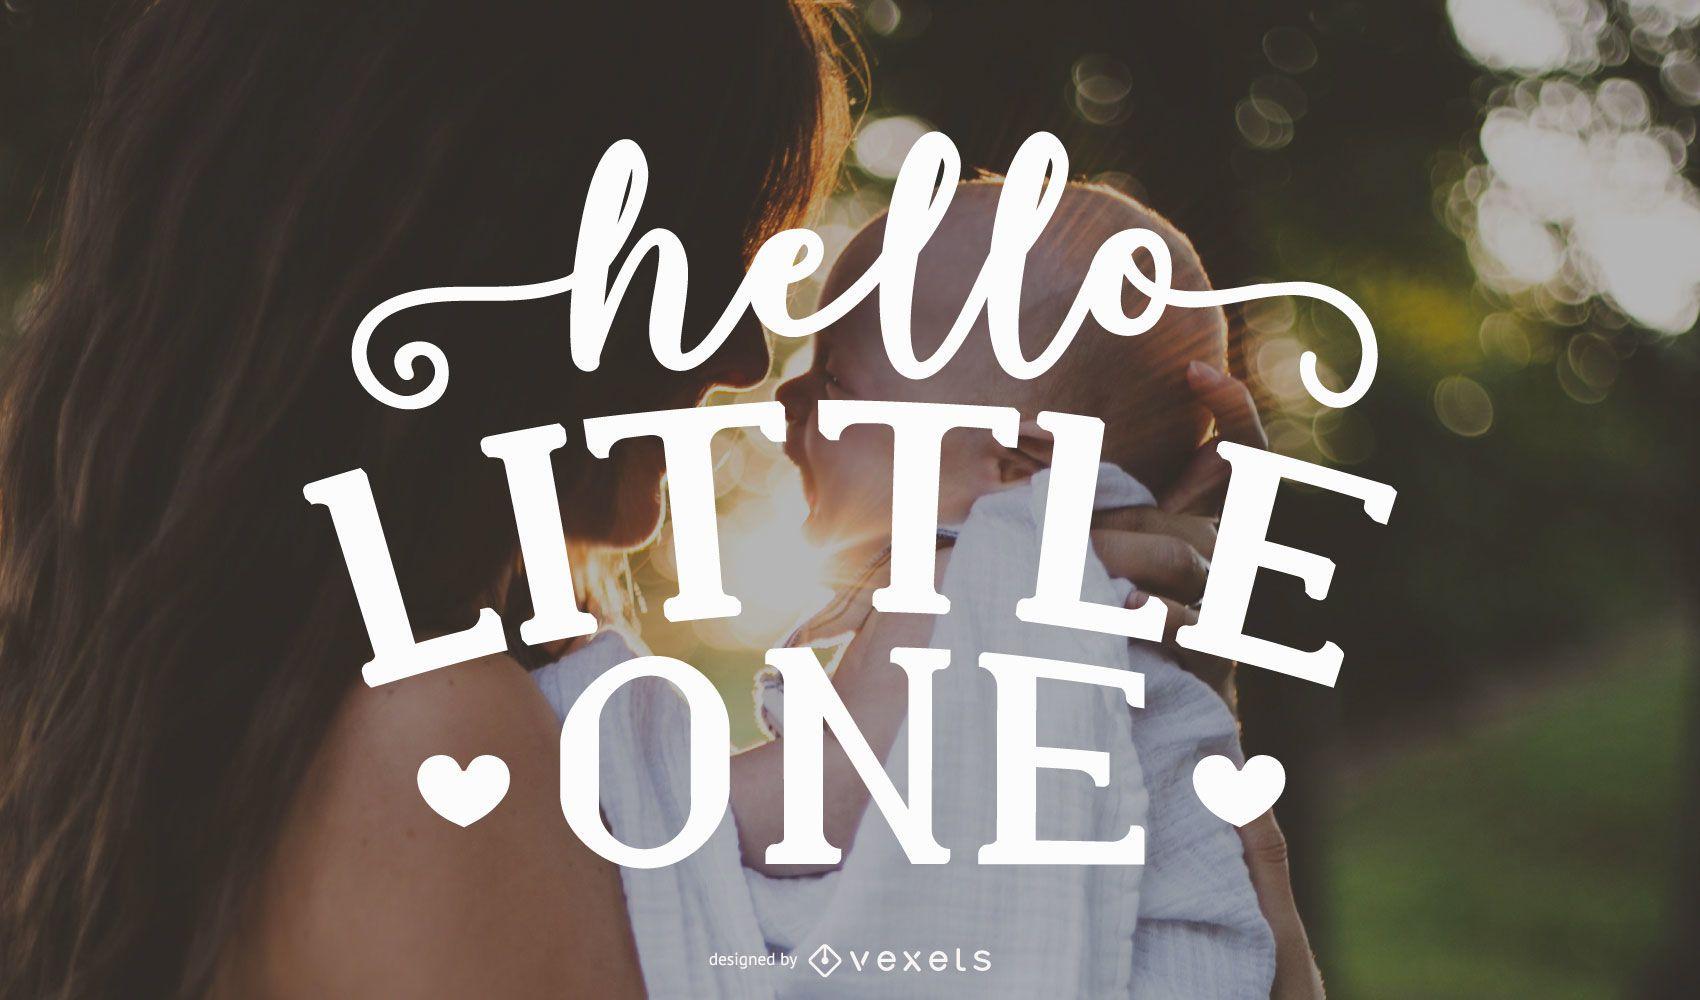 Hello Little One Lettering Background Design